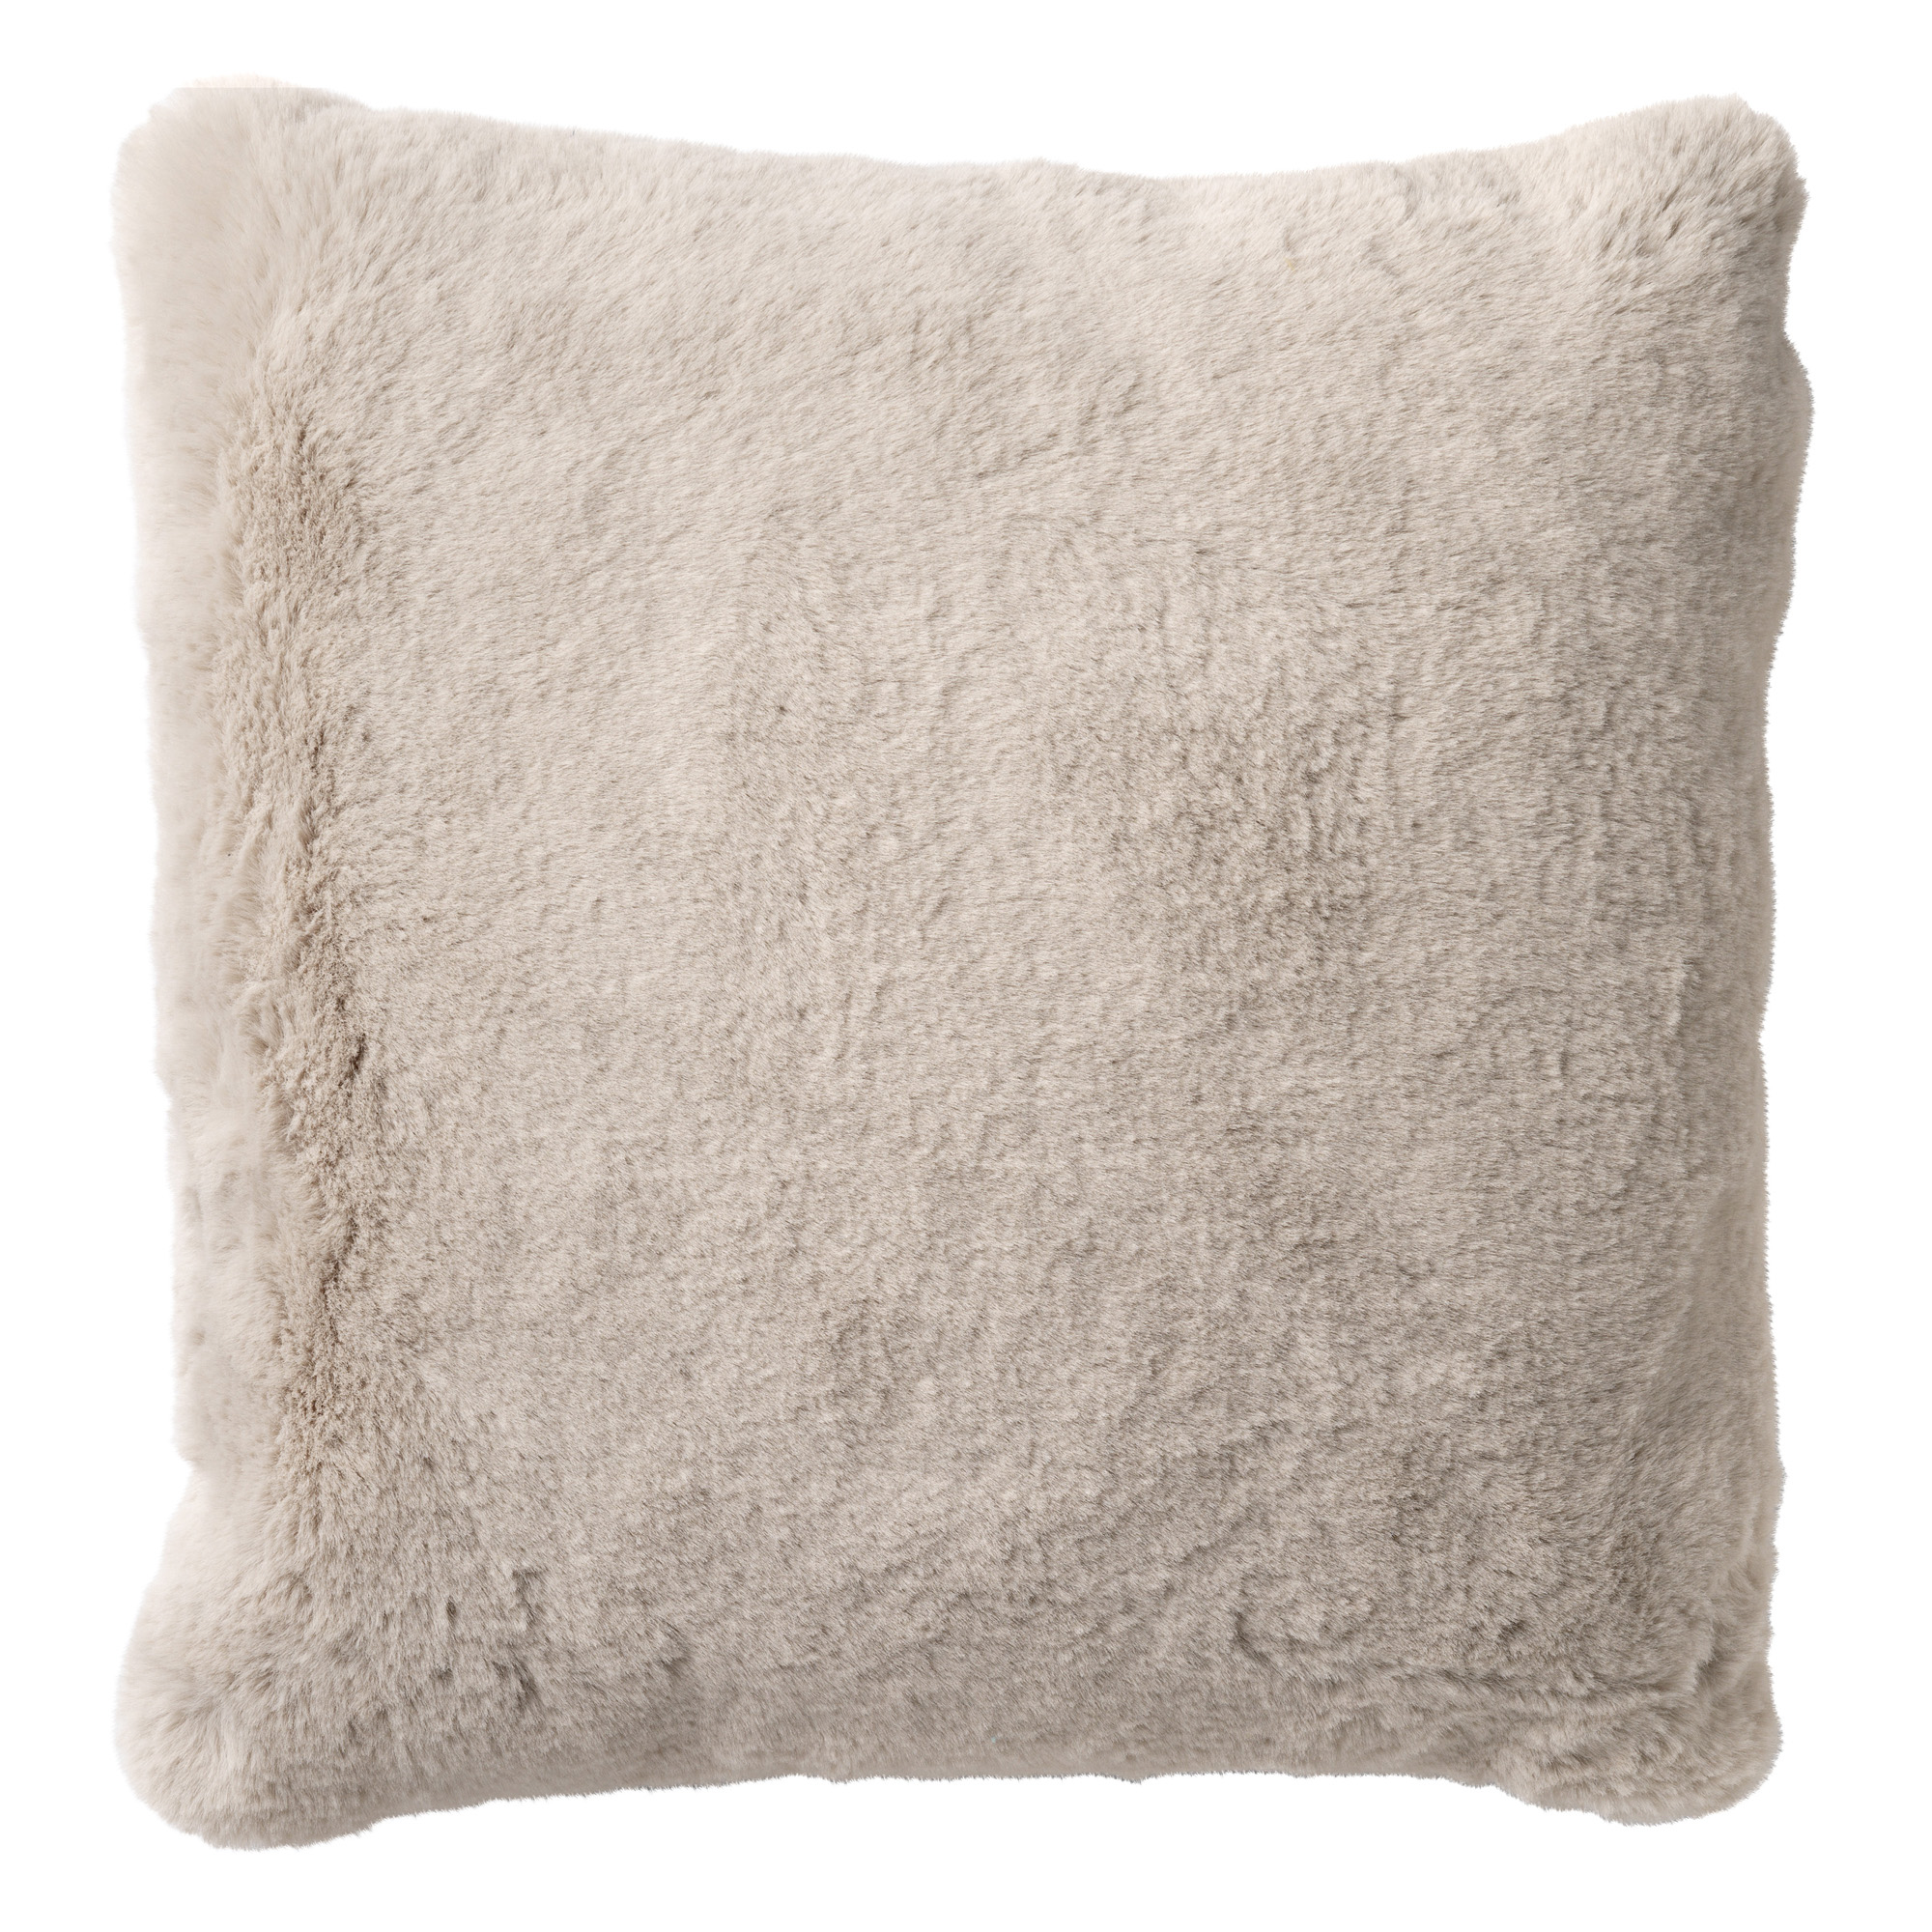 ZAYA - Sierkussen unikleur Pumice Stone 45x45 cm